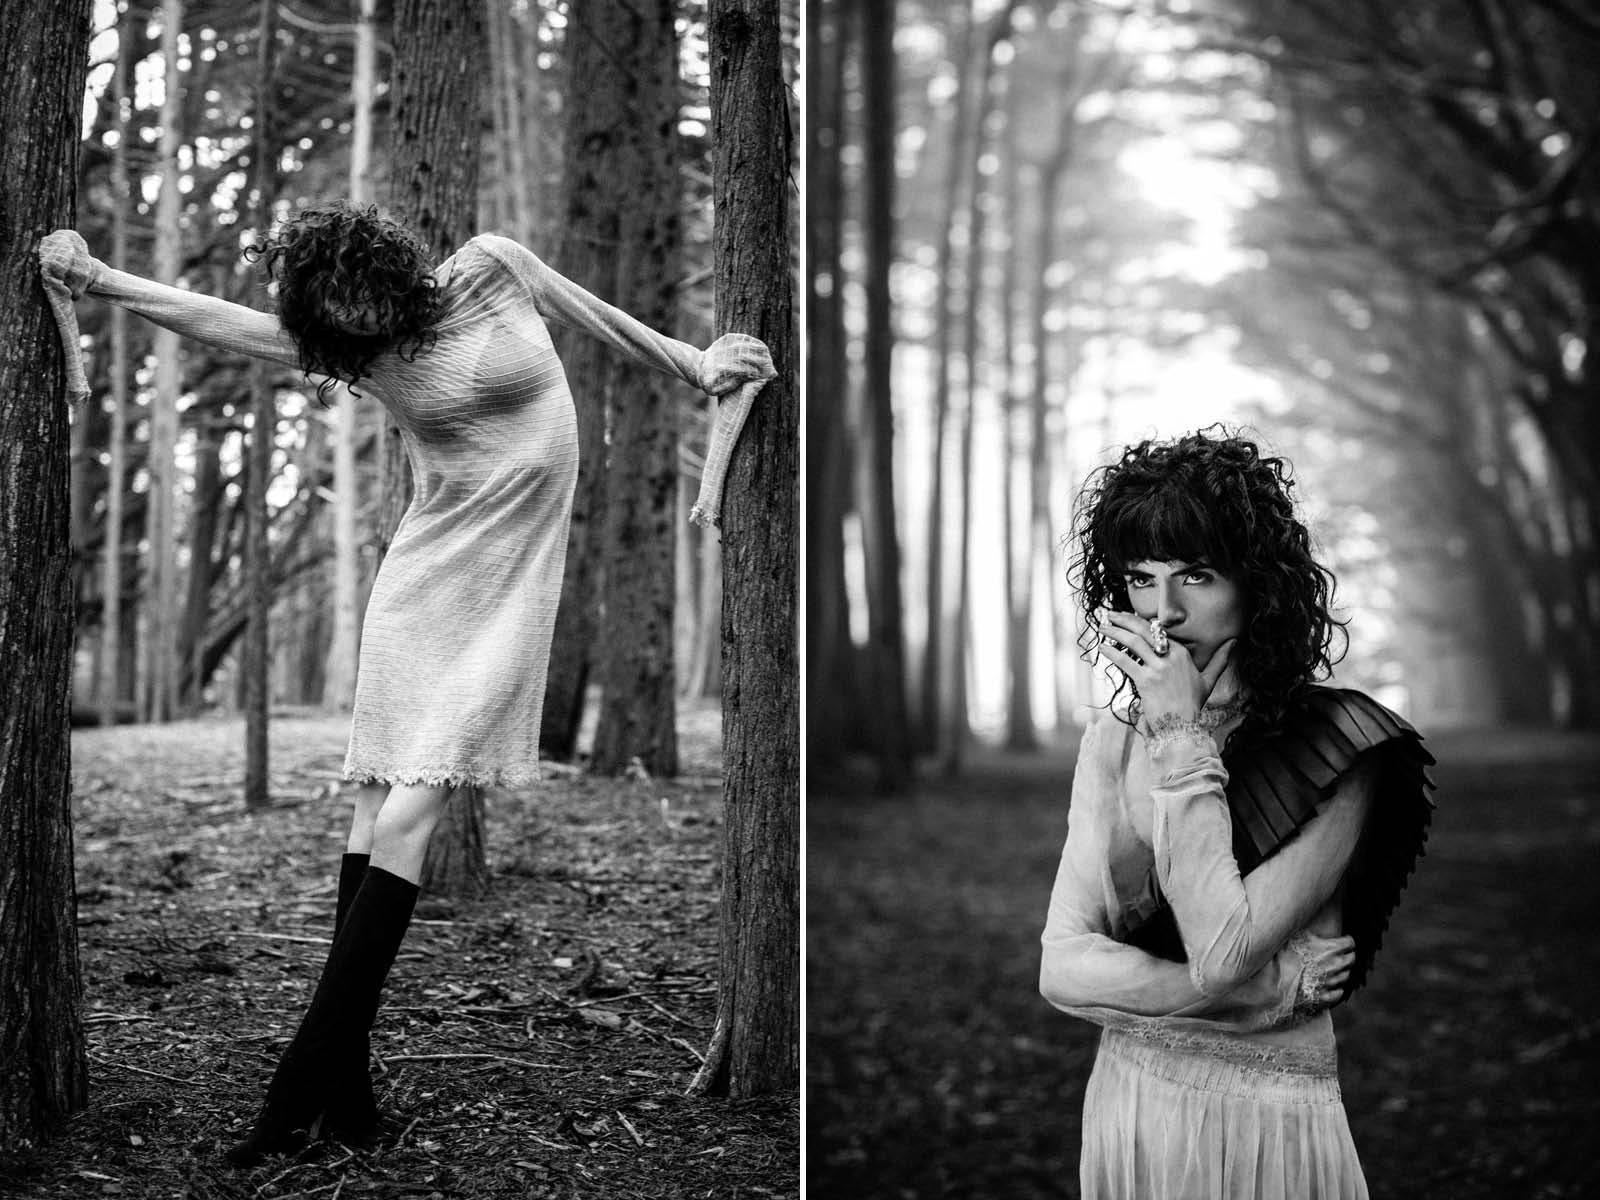 Spirit-&-Fles_MAGYARUL-DANCE_by_Matt-Licari_2